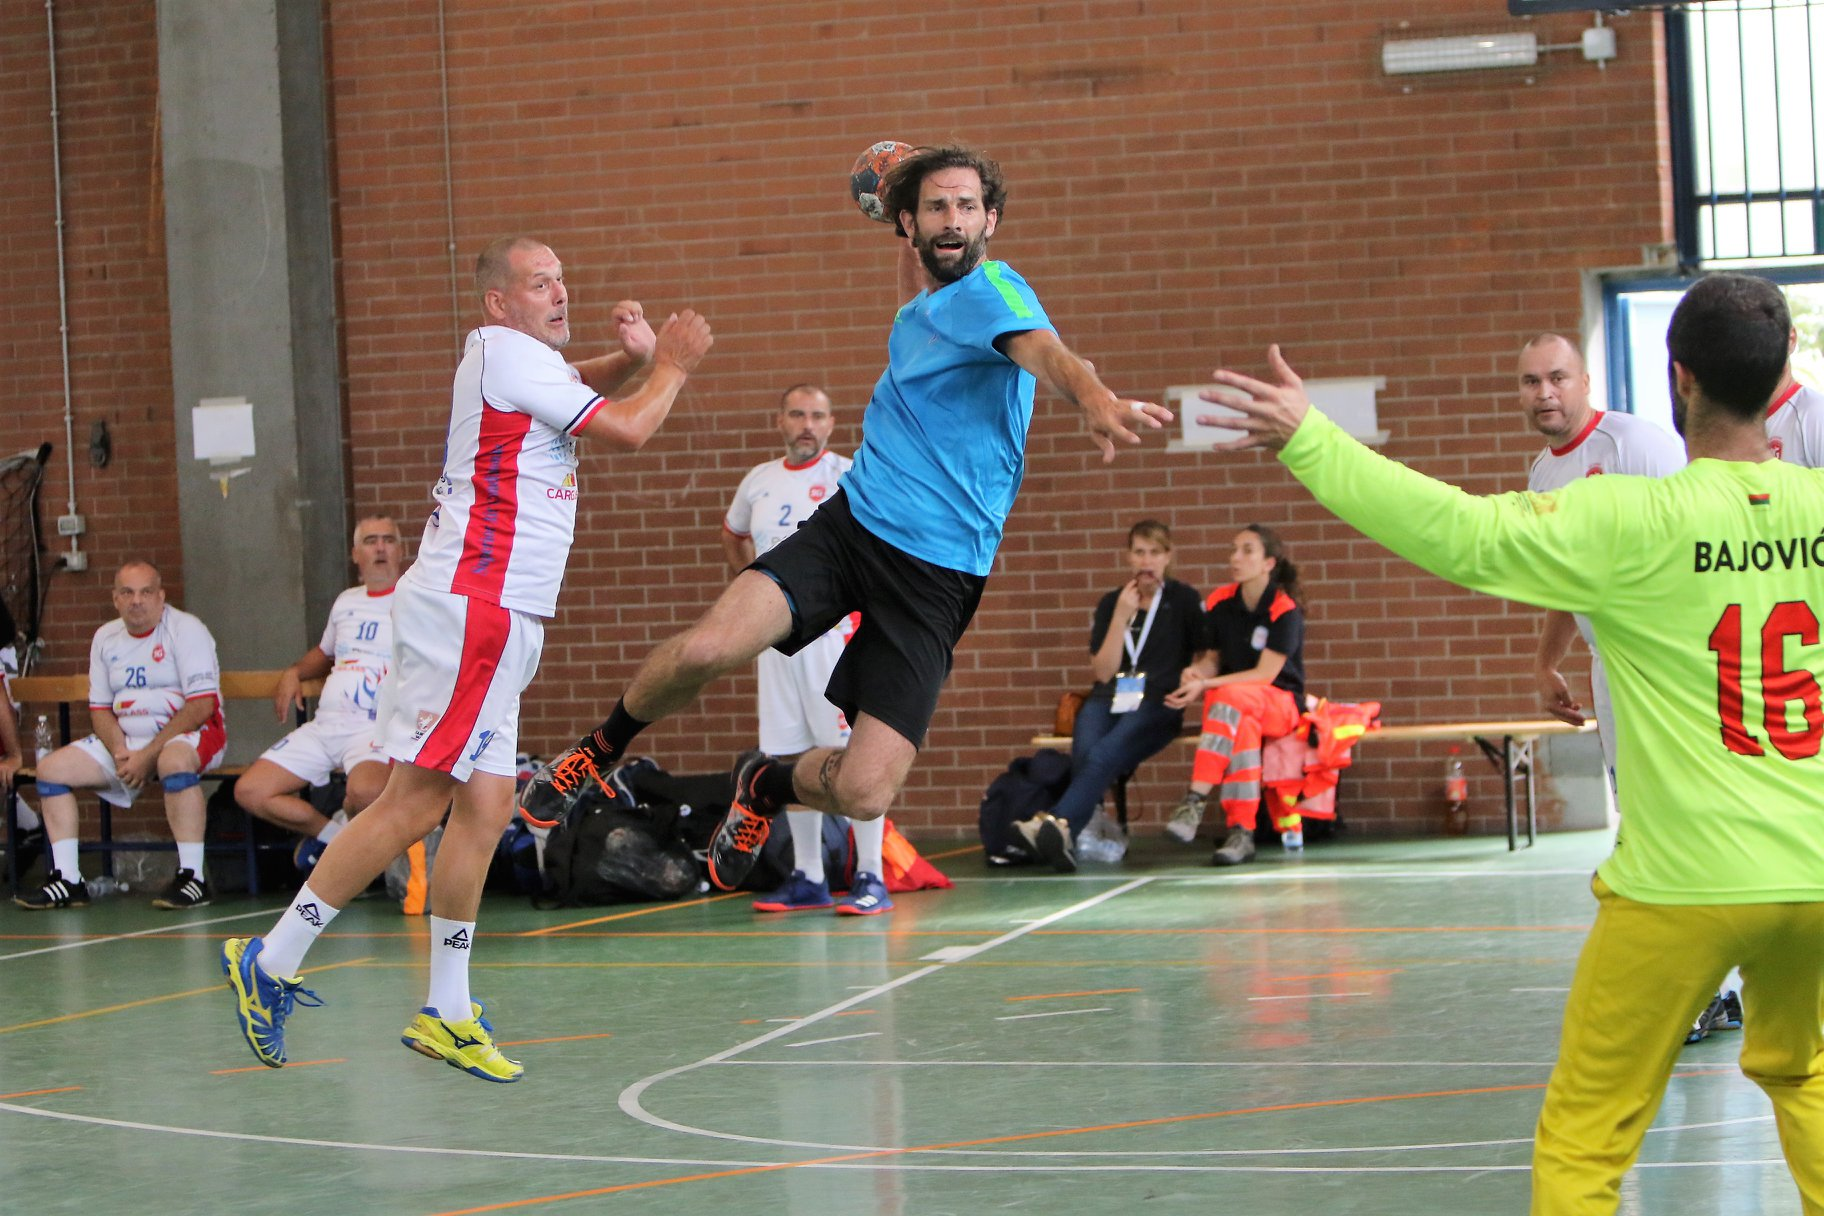 Coloriste St Martin De Seignanx handball: pierre malfoy remporte tournoi de vétérans avec